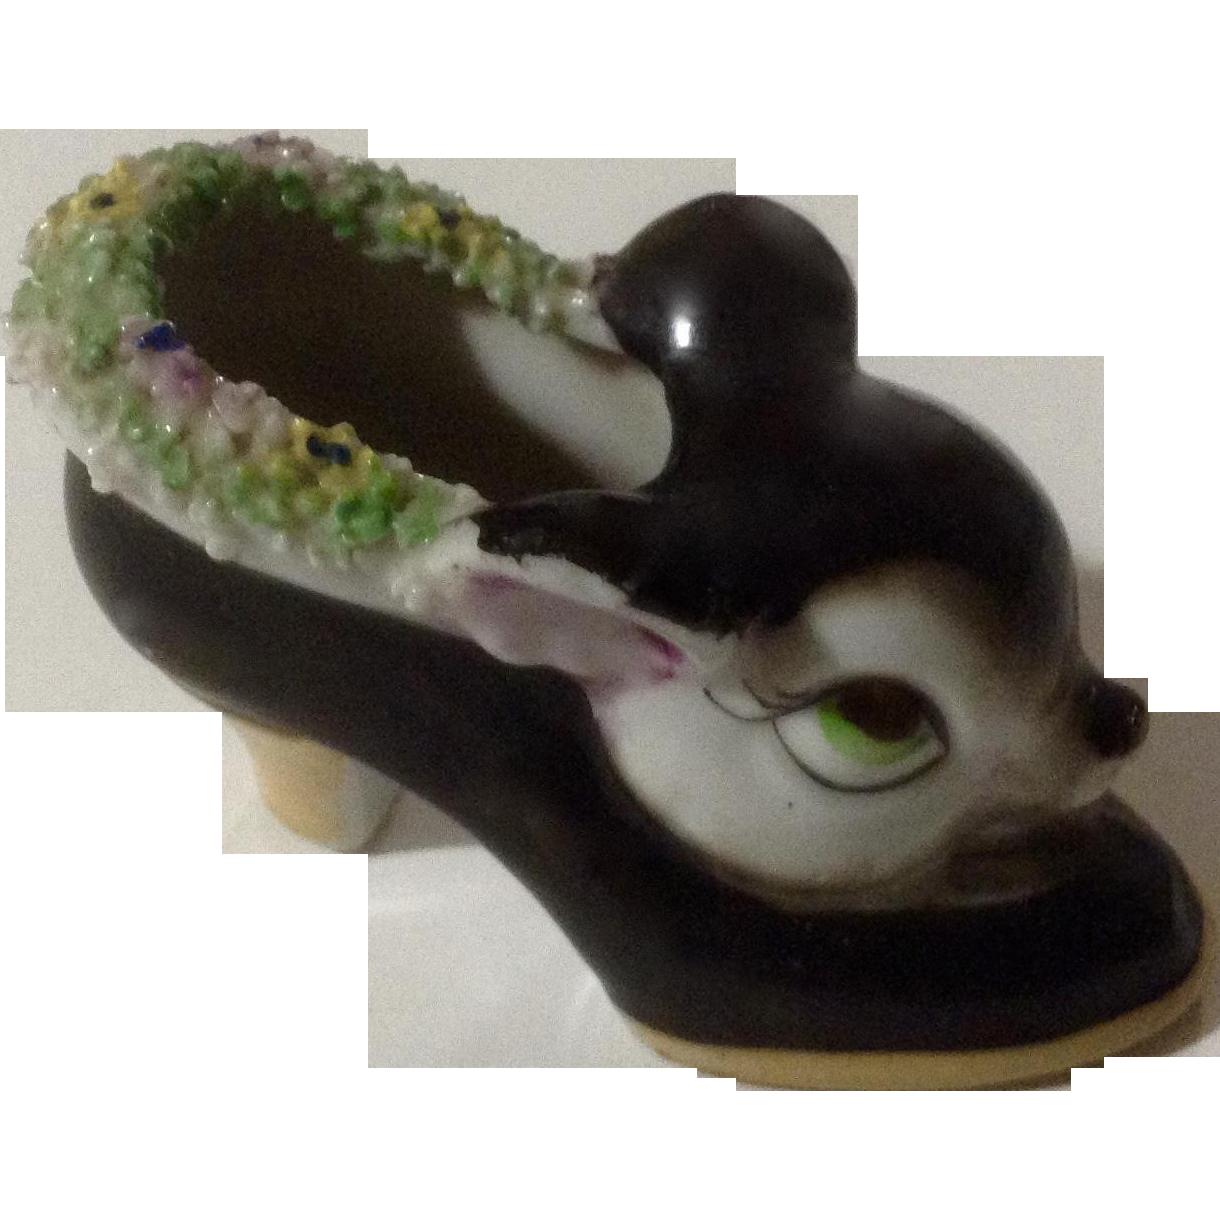 Deer Head Shoe Rare Big Eye Porcelain Ceramic Figurine